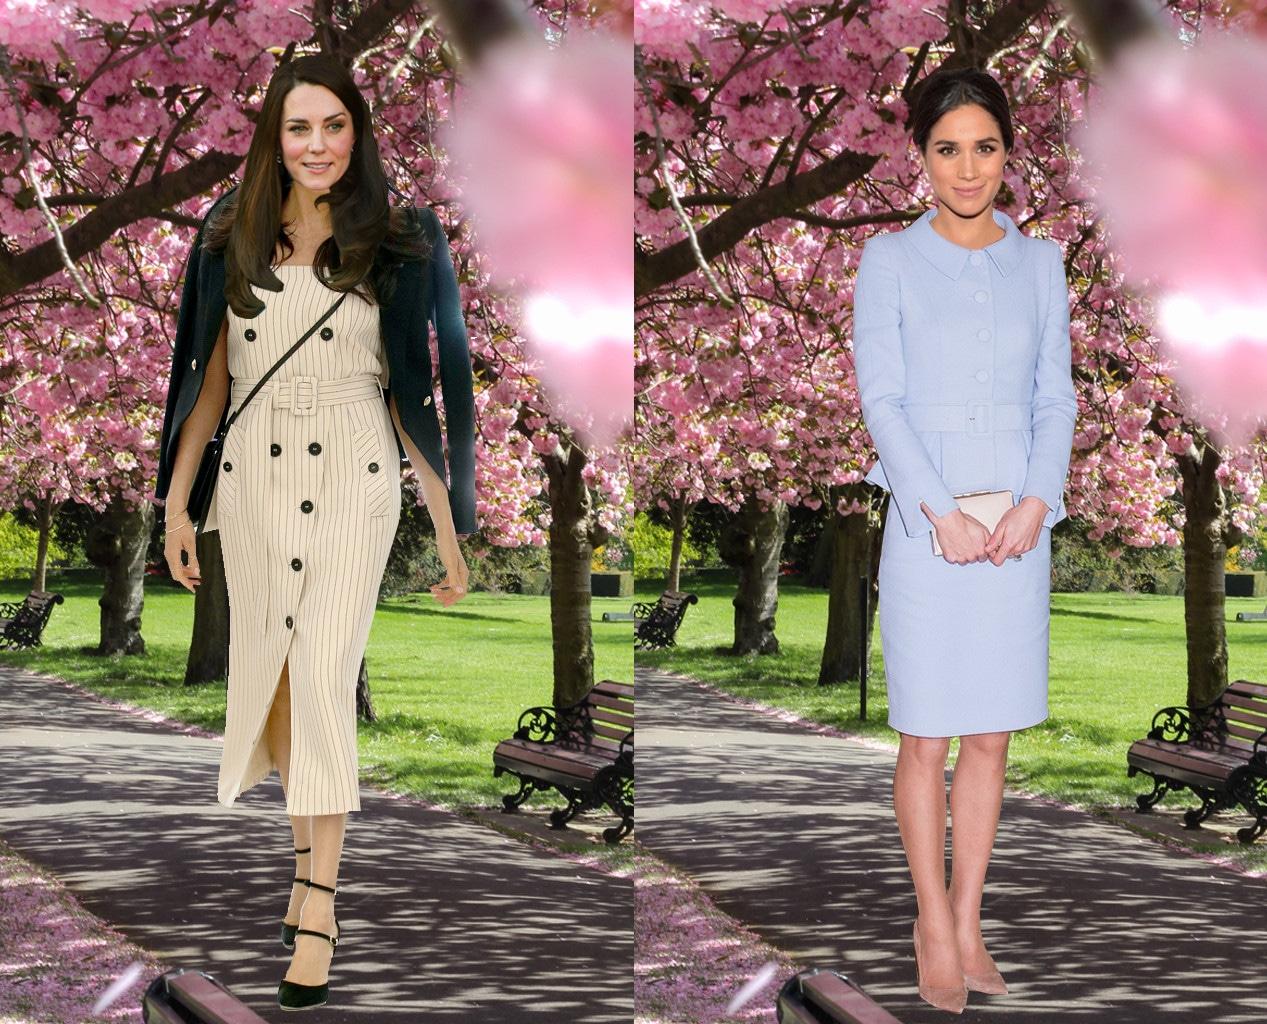 Meghan Markle, Kate Middleton, Outfit Swap, Daytime